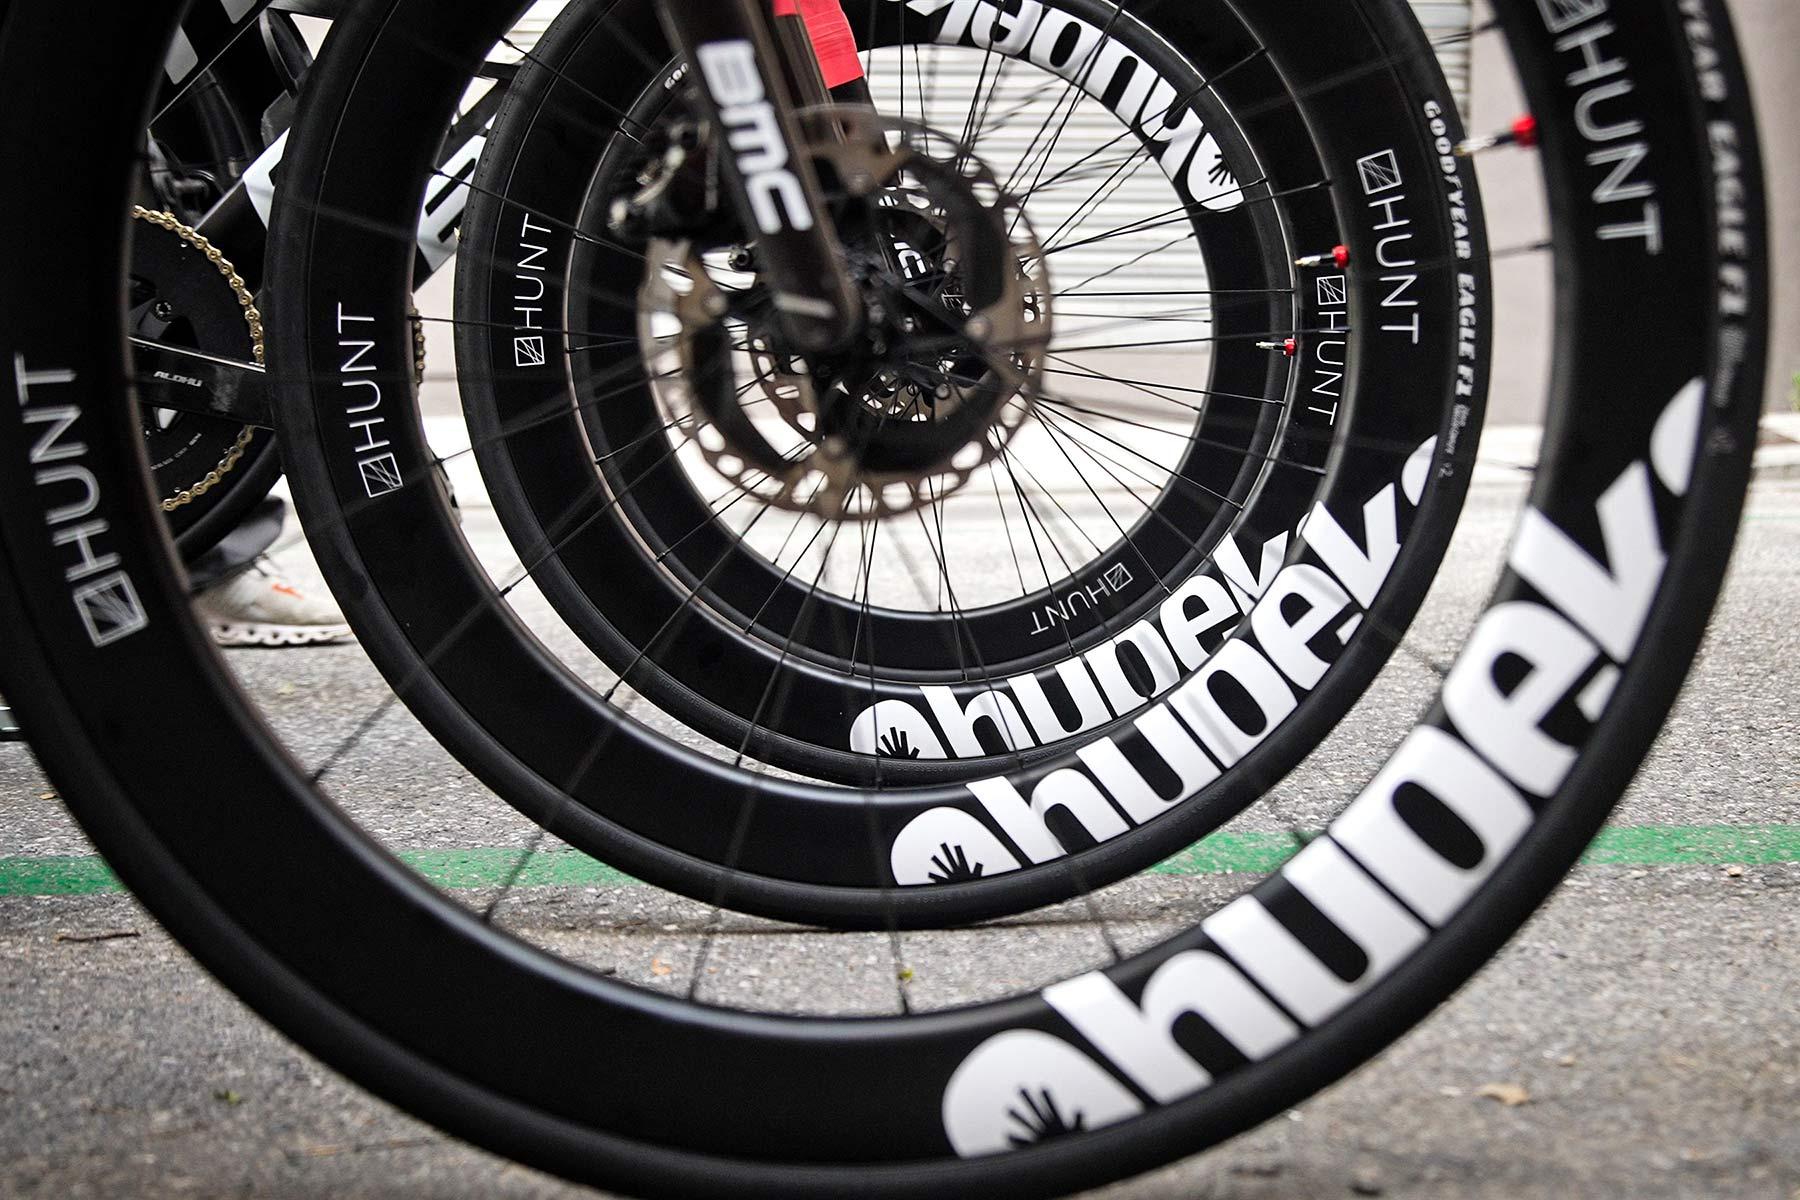 Qhubeka x Hunt 54 Aerodynamicist Carbon Disc wheels, Tour de France-raced tubeless carbon aero road wheels for charity, wheels